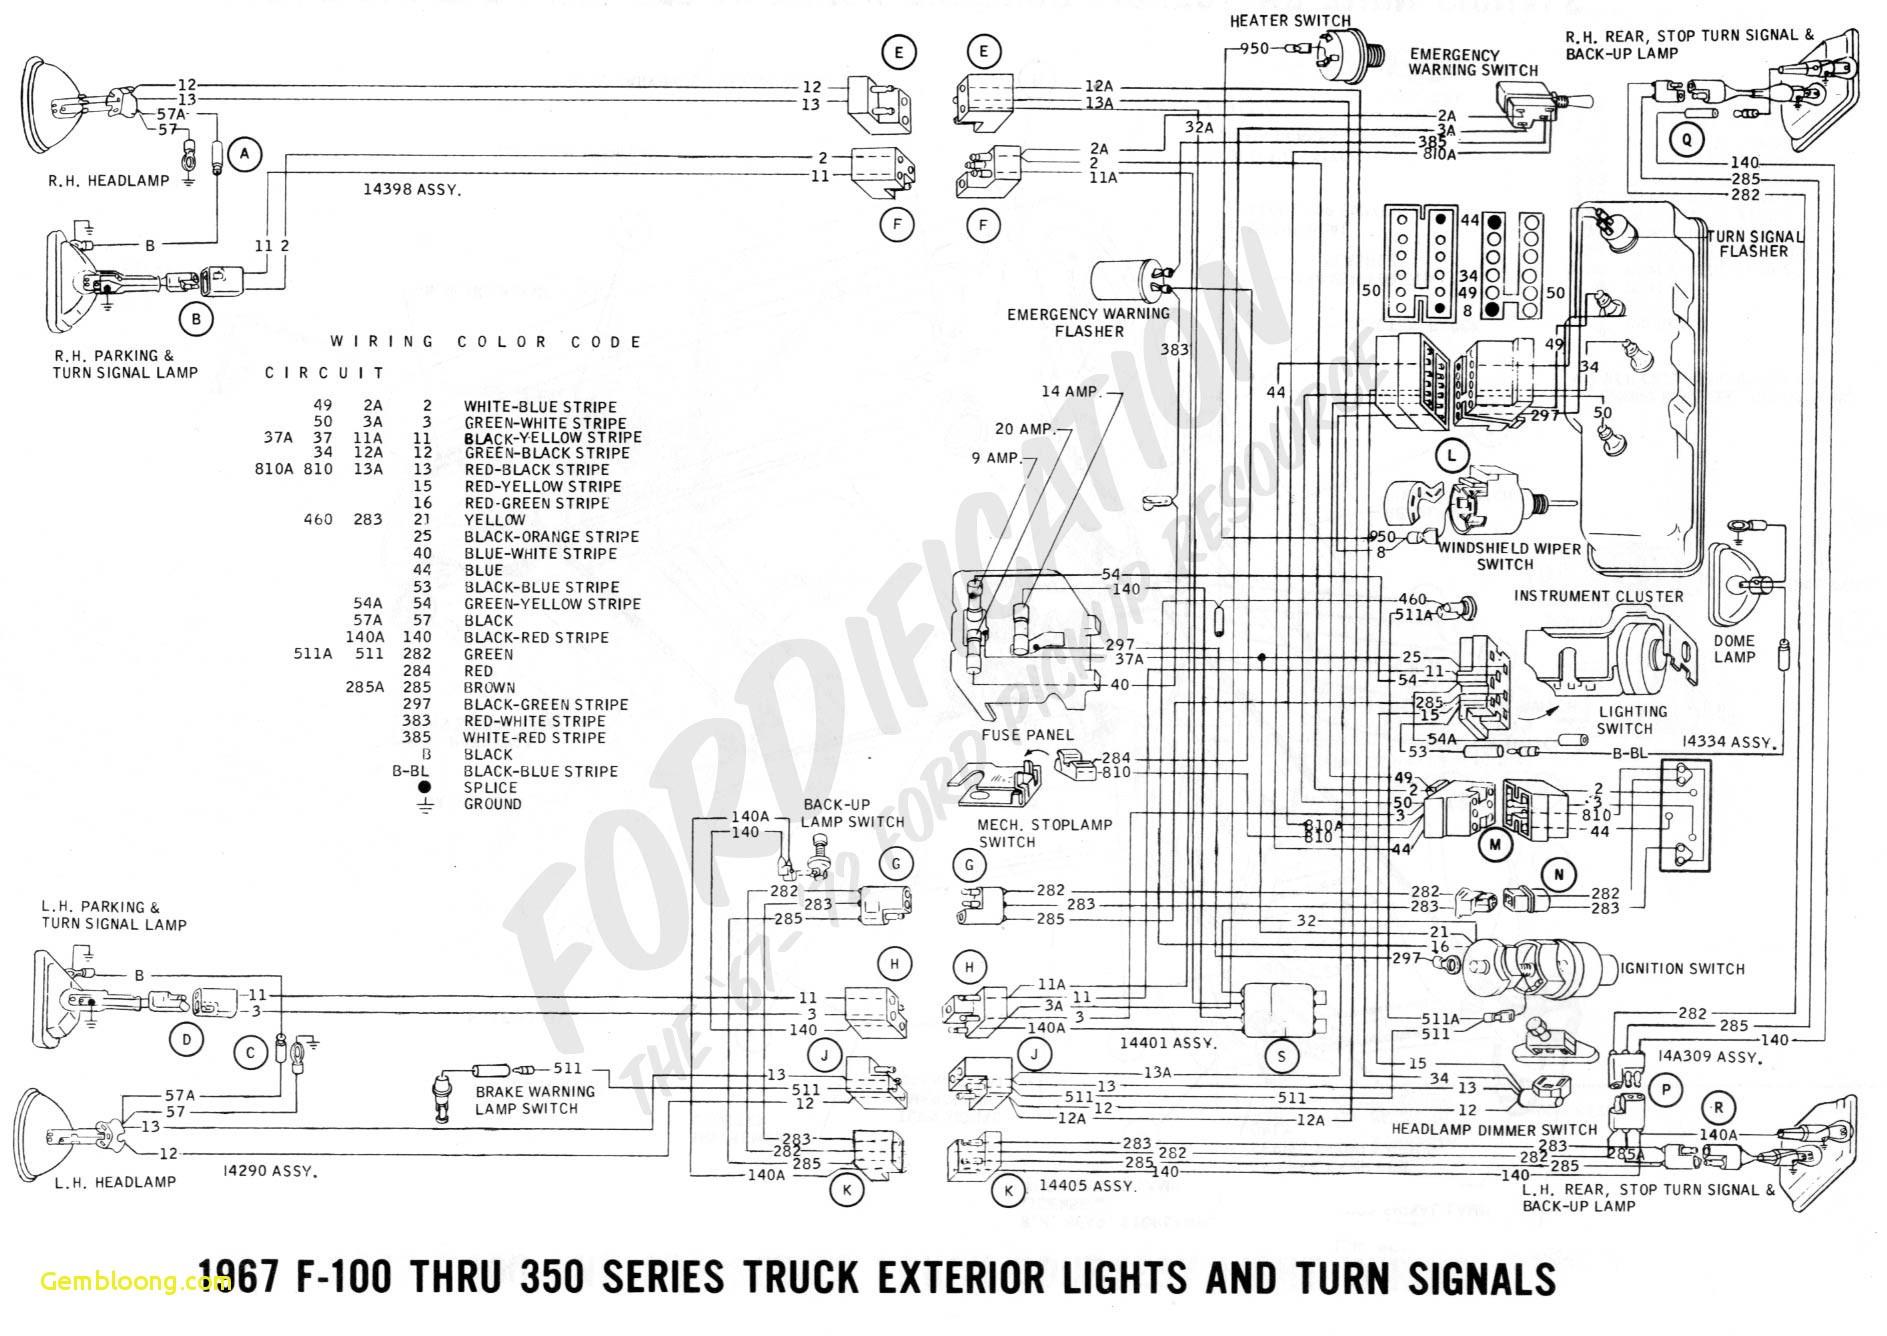 Boxer Engine Diagram Download ford Trucks Wiring Diagrams ford F150 Wiring Diagrams Best Of Boxer Engine Diagram